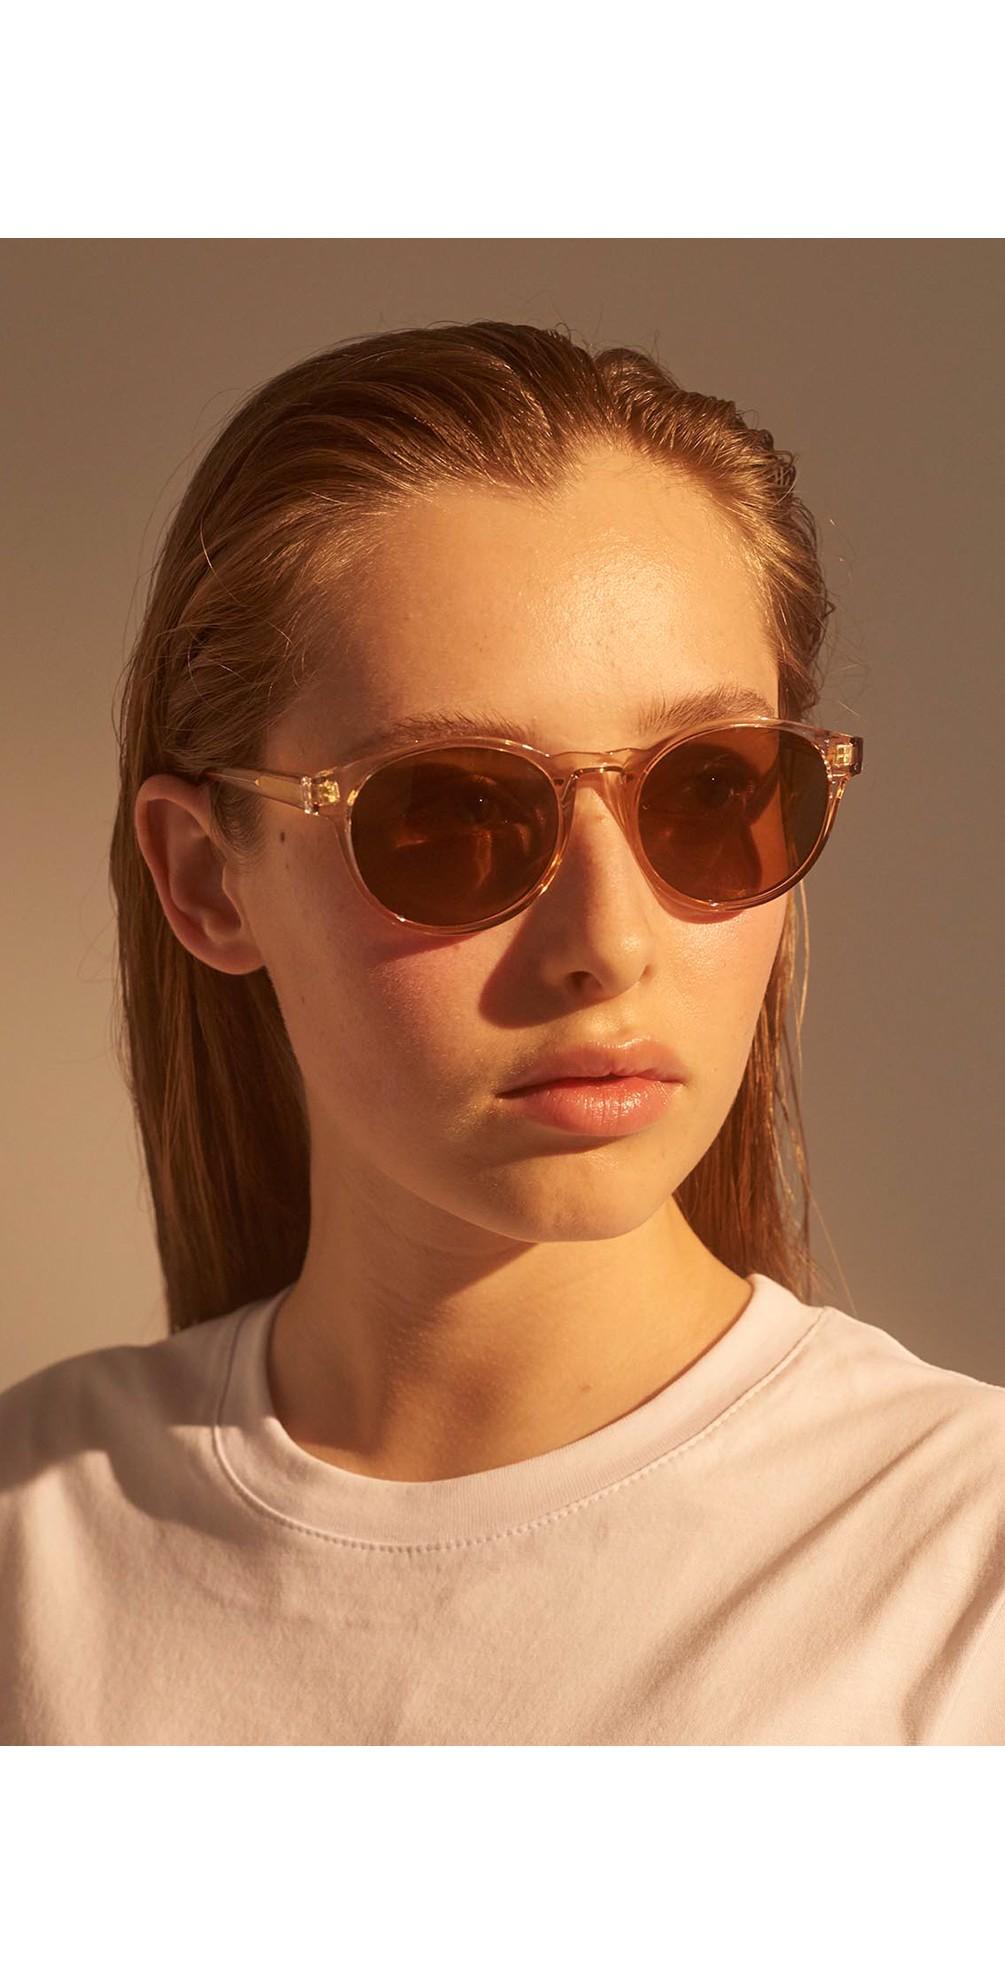 Marvin Sunglasses main image